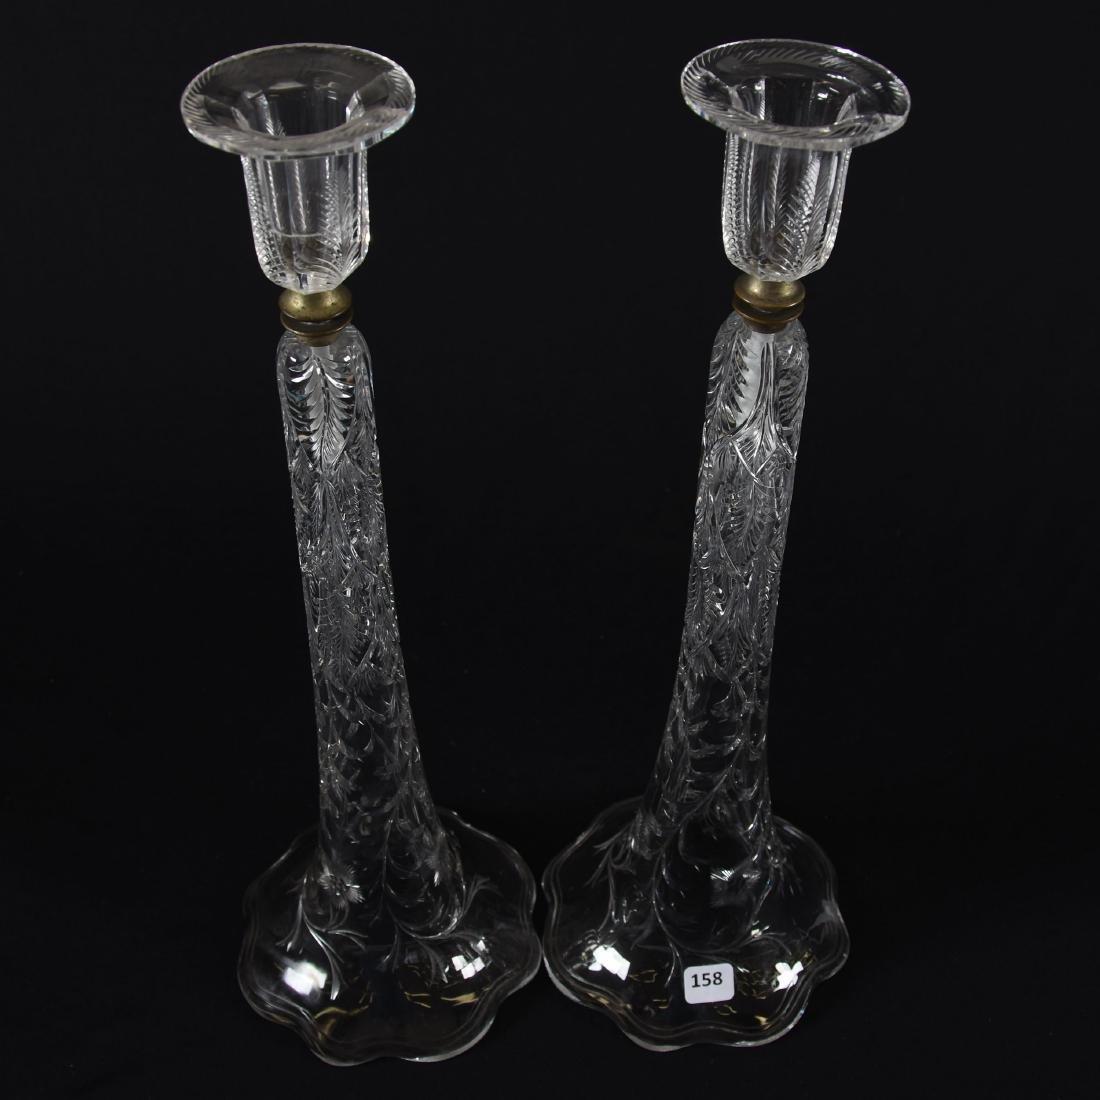 Pair Candlesticks, Engraved Fern, Vine & Floral - 2